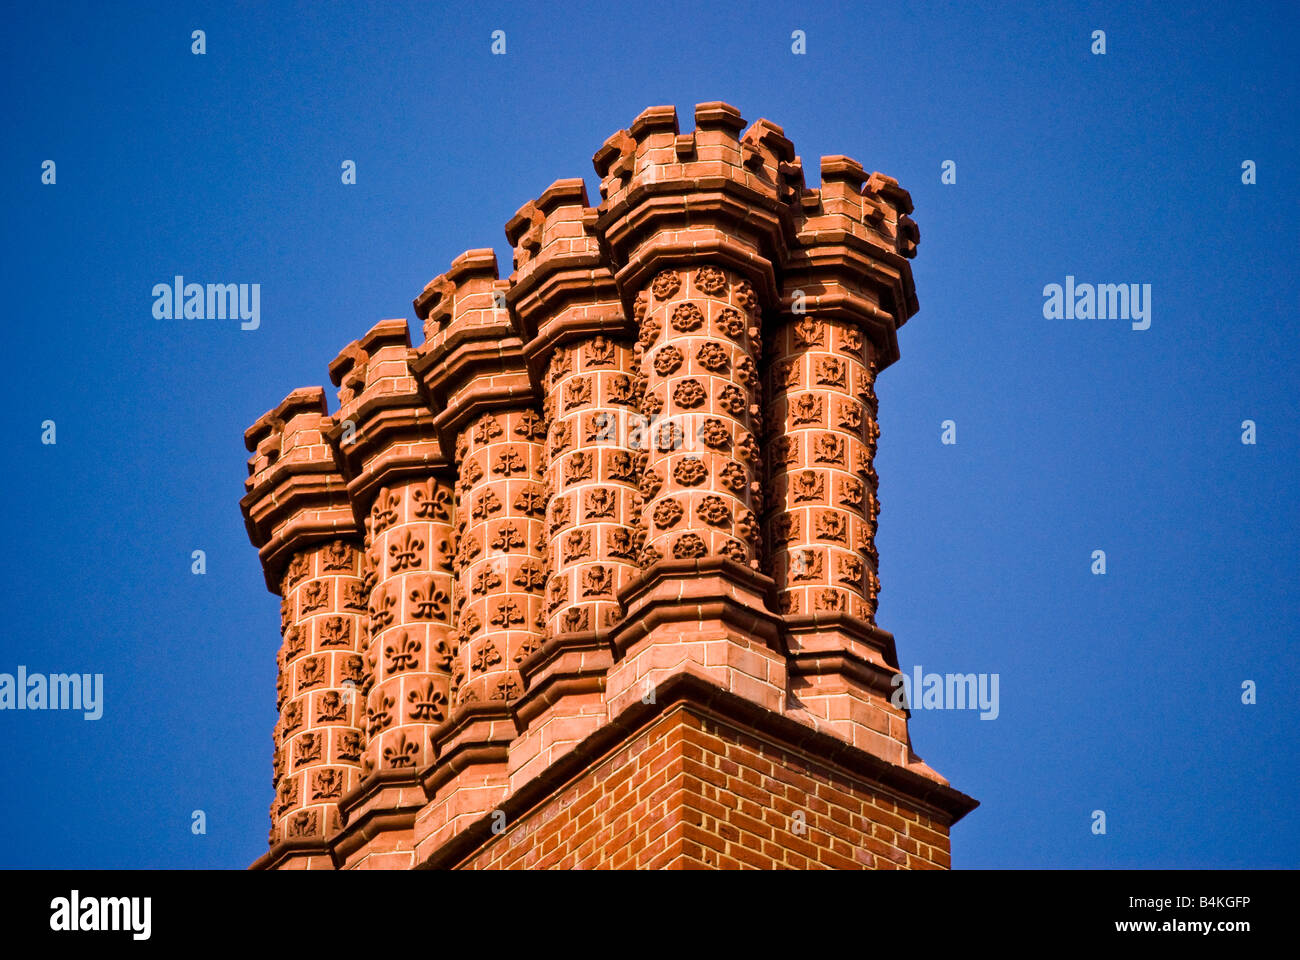 Fancy chimney pots on roof, London - Stock Image